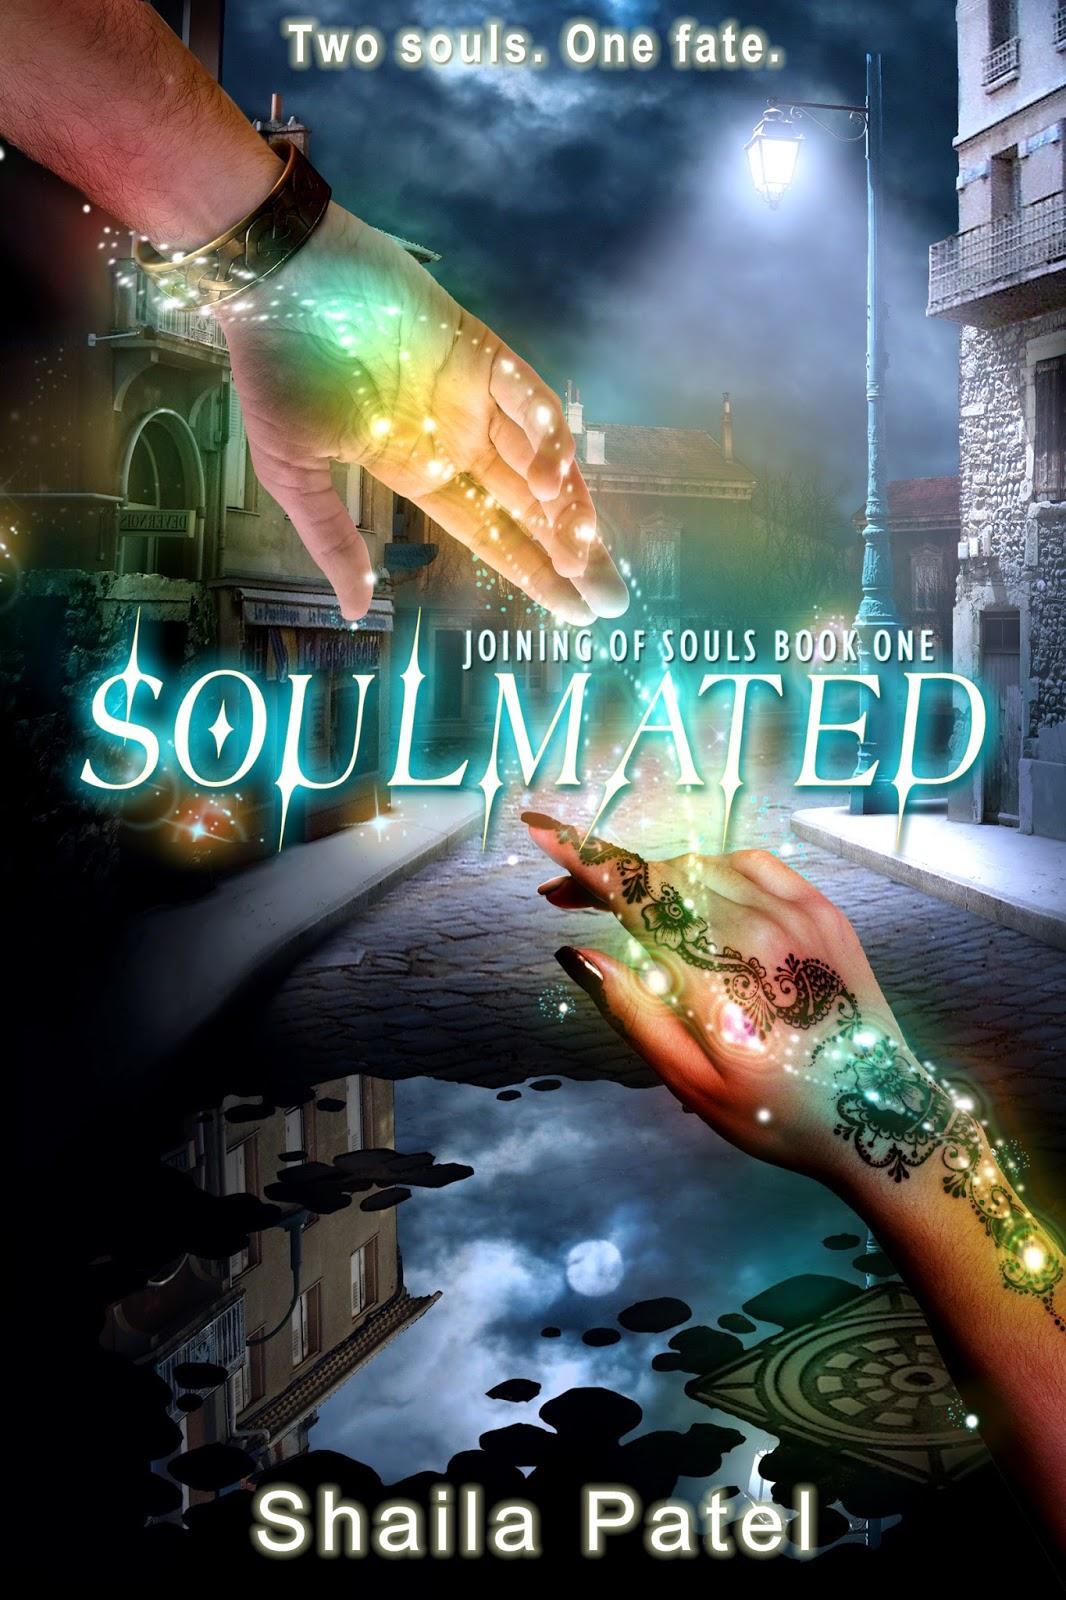 Soulmated by Shaila Patel